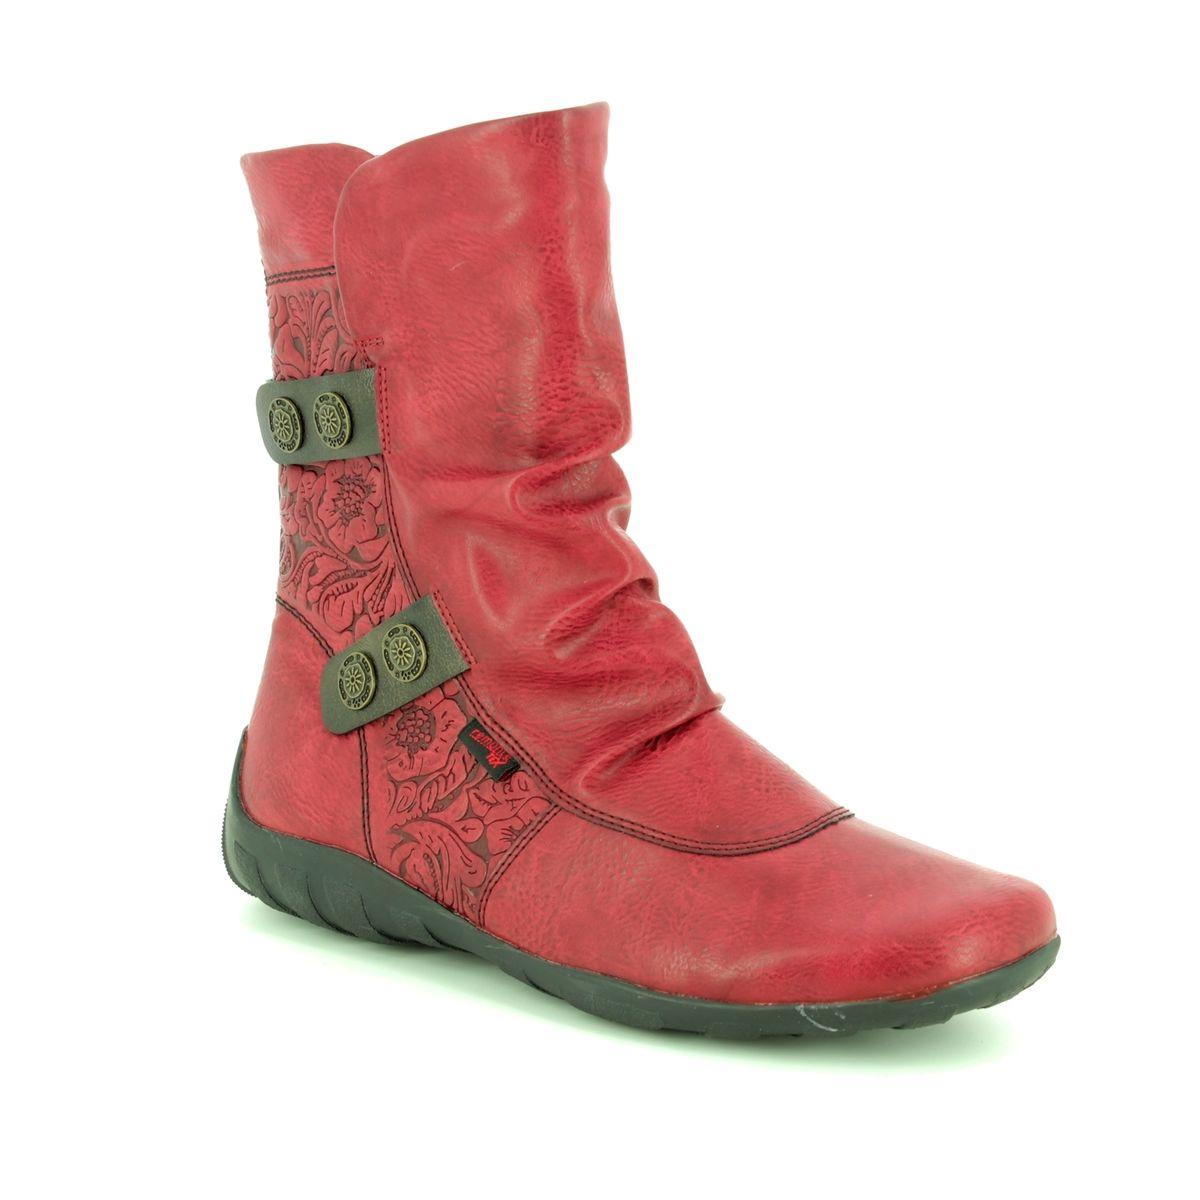 fd4376724c70 Remonte Ankle Boots - Wine - R3495-35 LIVMIDLASER TE